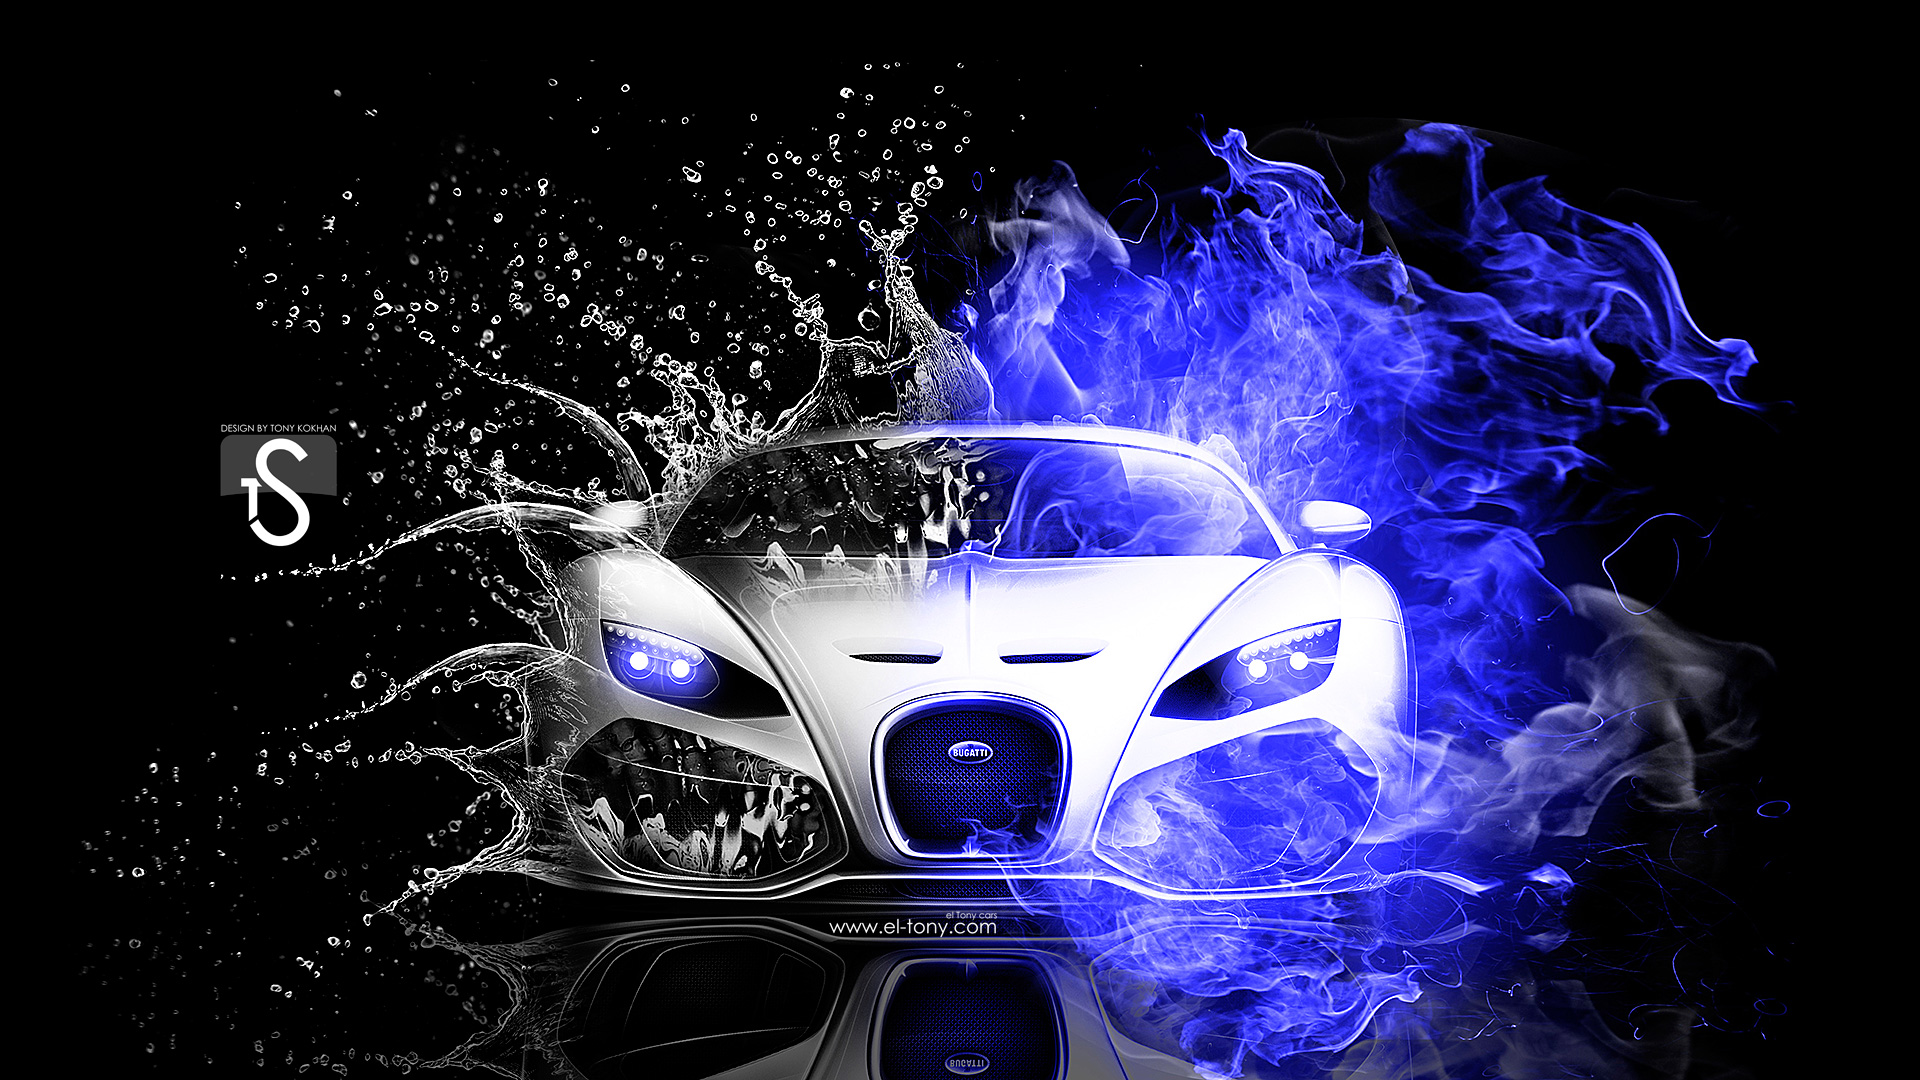 Blue And Black Bugatti Wallpaper 24 Free Hd Wallpaper ...